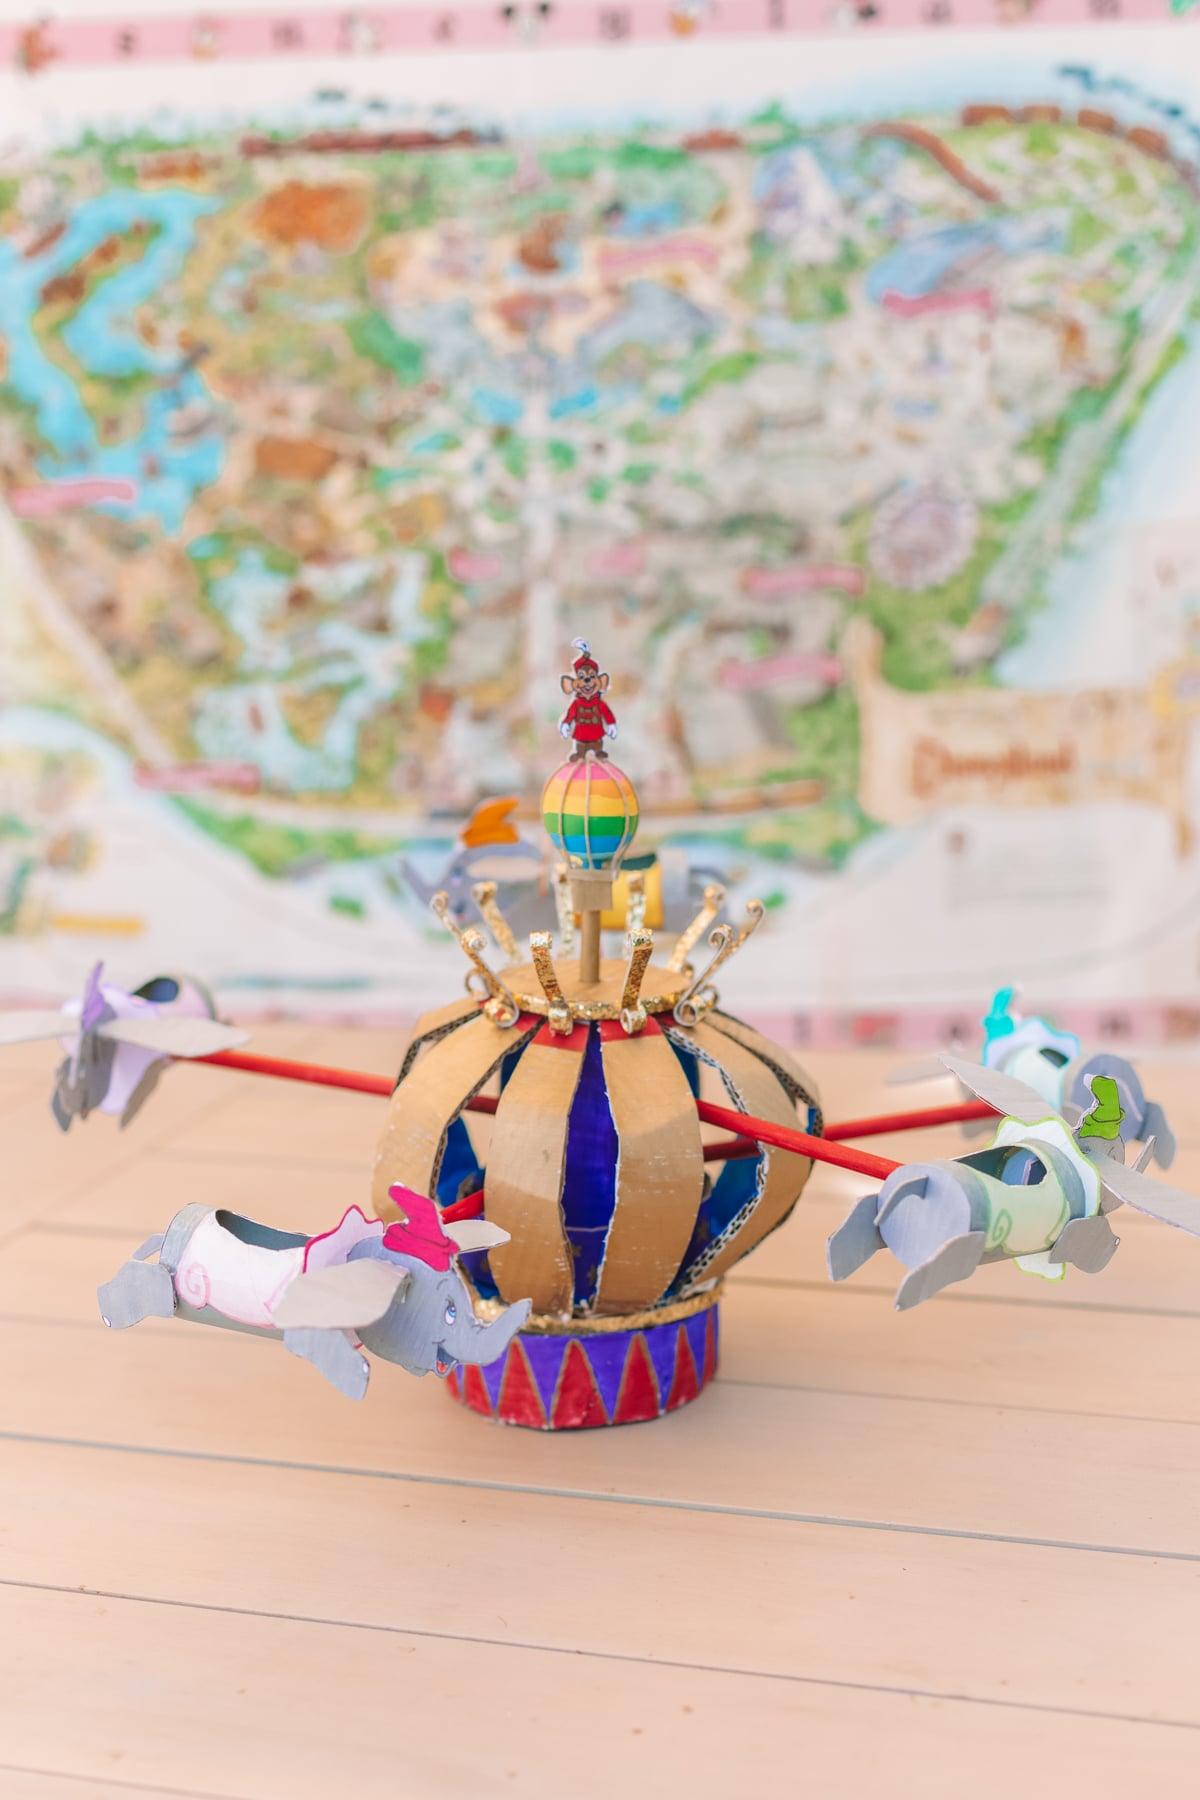 How To Make a Disneyland Cardboard Dumbo Ride